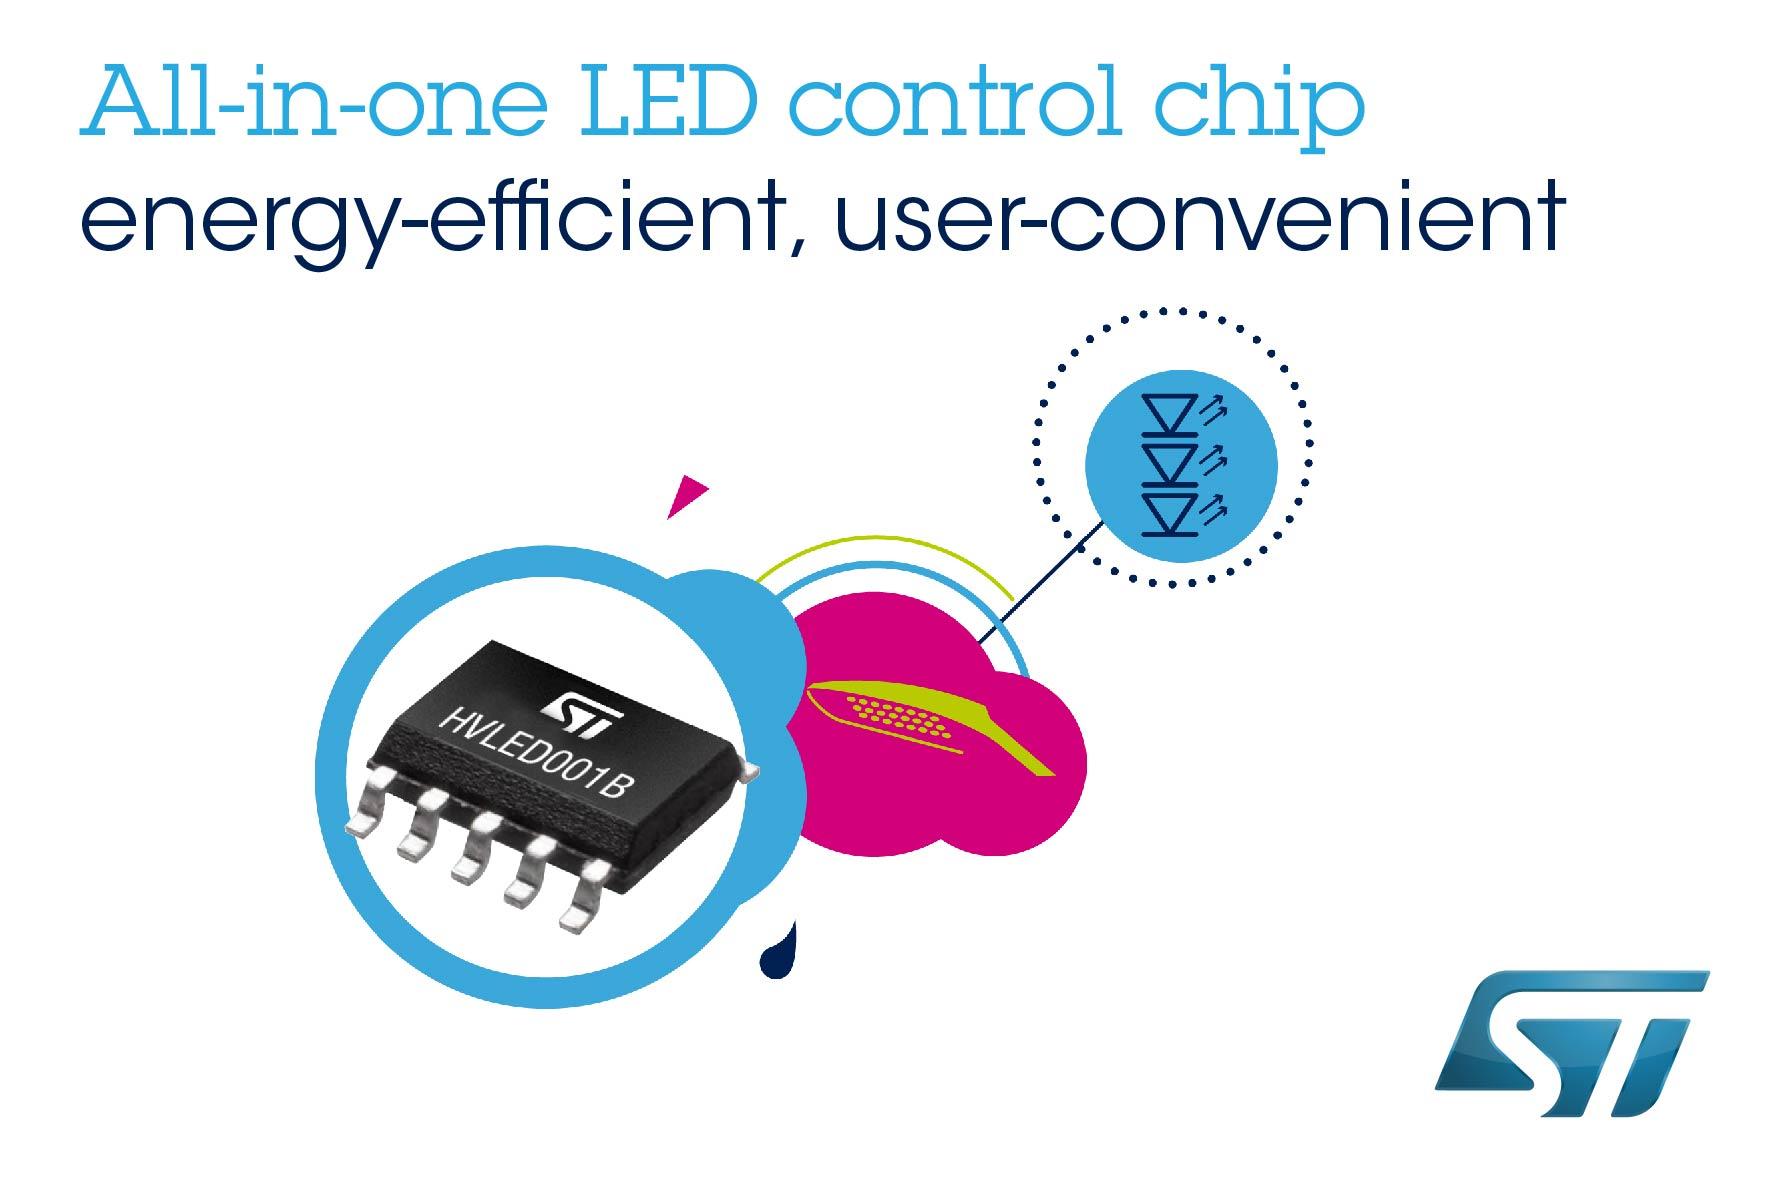 ST推出最先进的照明控制器 使灯具设计使用更简便